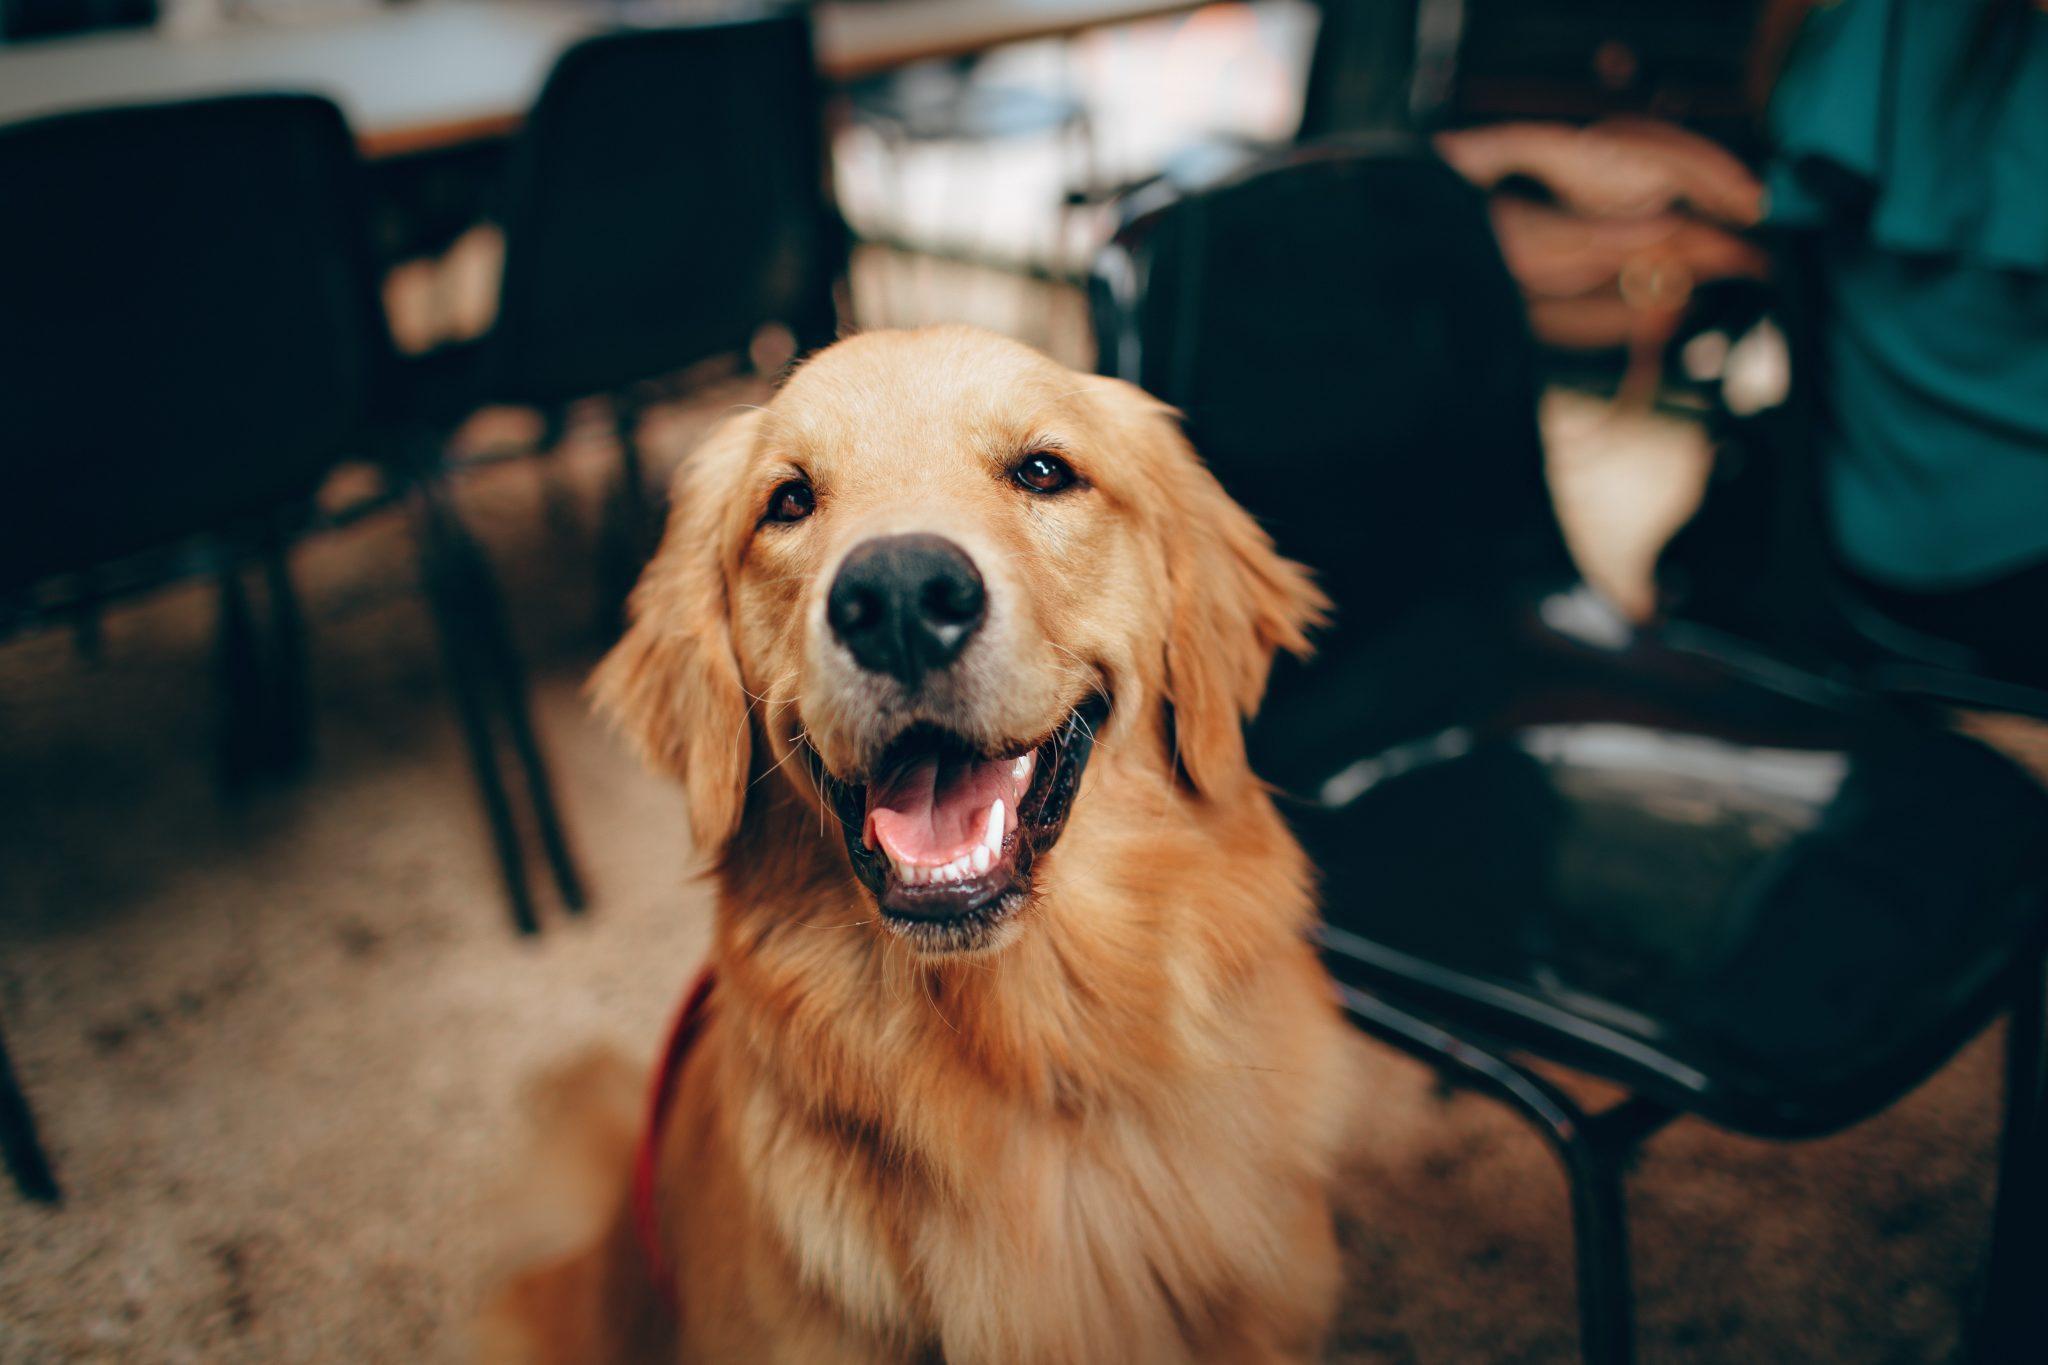 dog smiling indoors